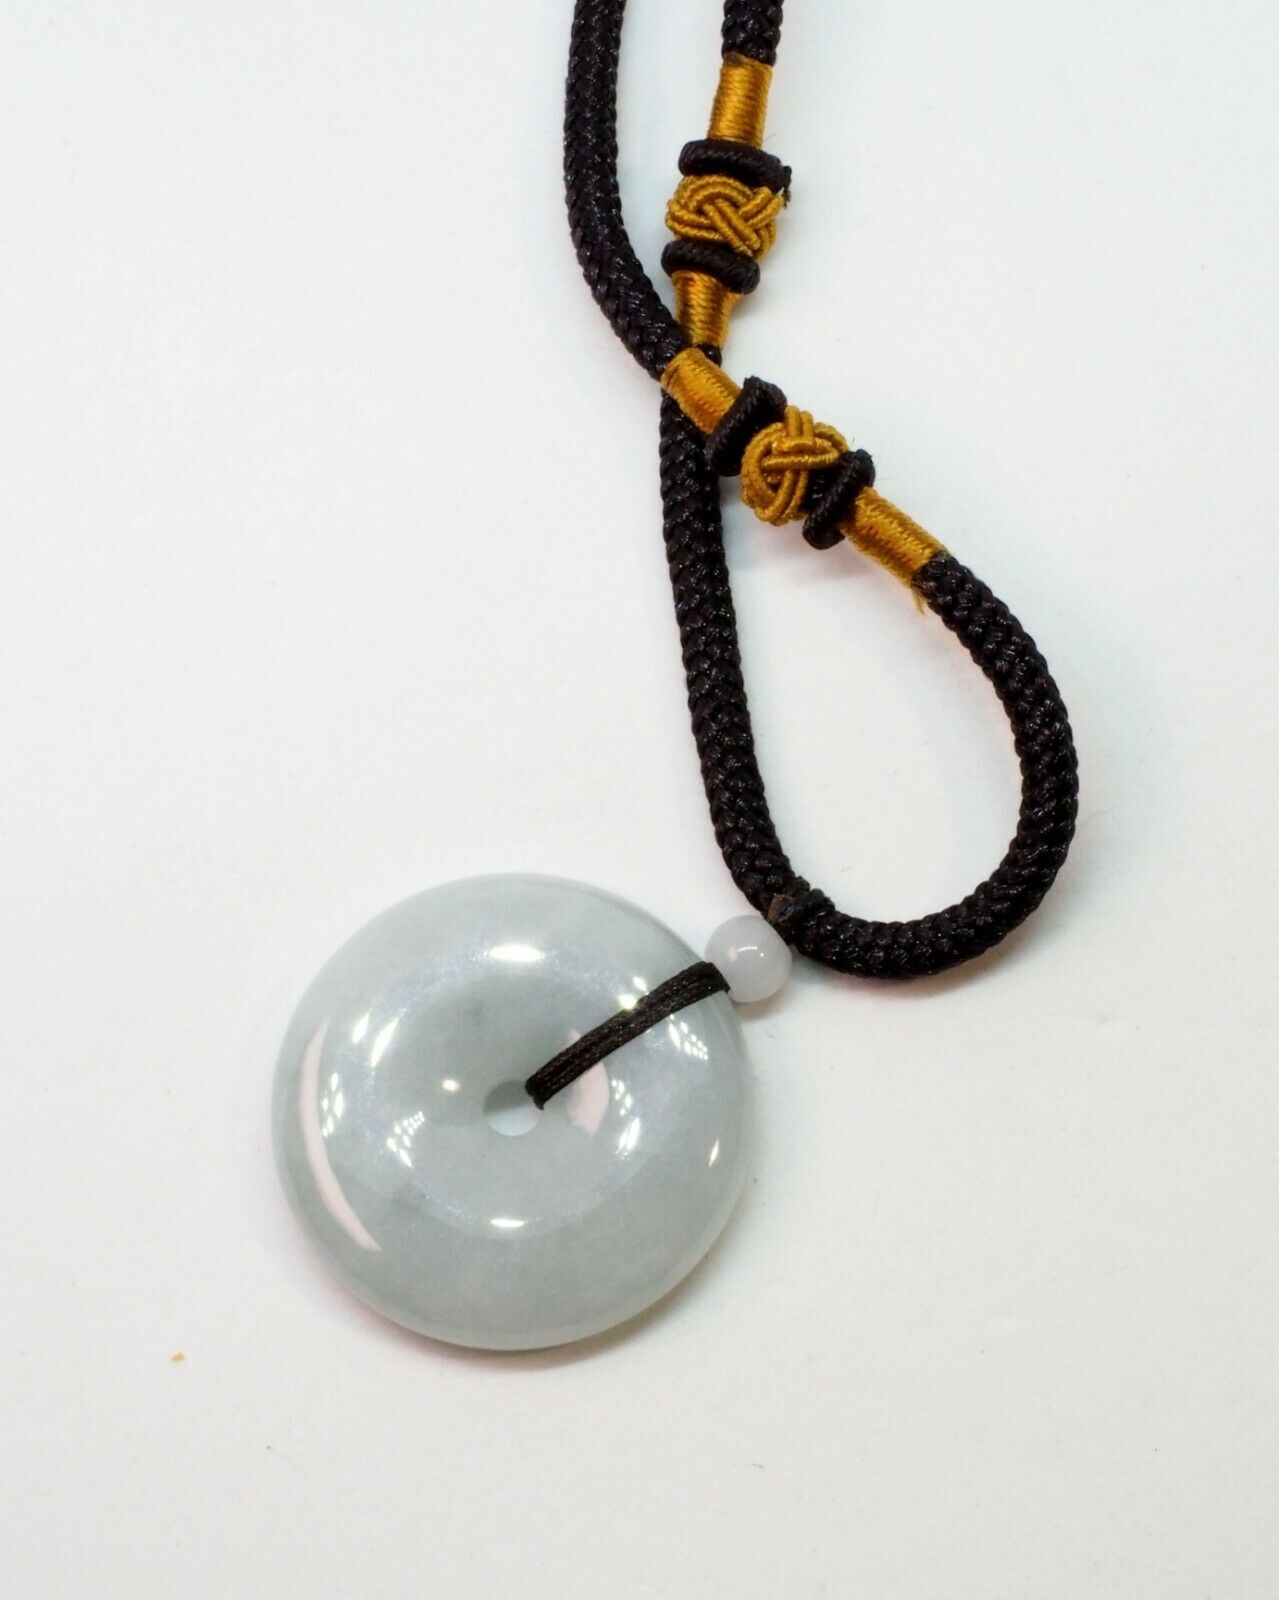 Necklace Natural Grade A Jade Chinese Jewelry Light Green Burma Burmese Gemstones 13.5mm Jadeite Jade Donut Pendant